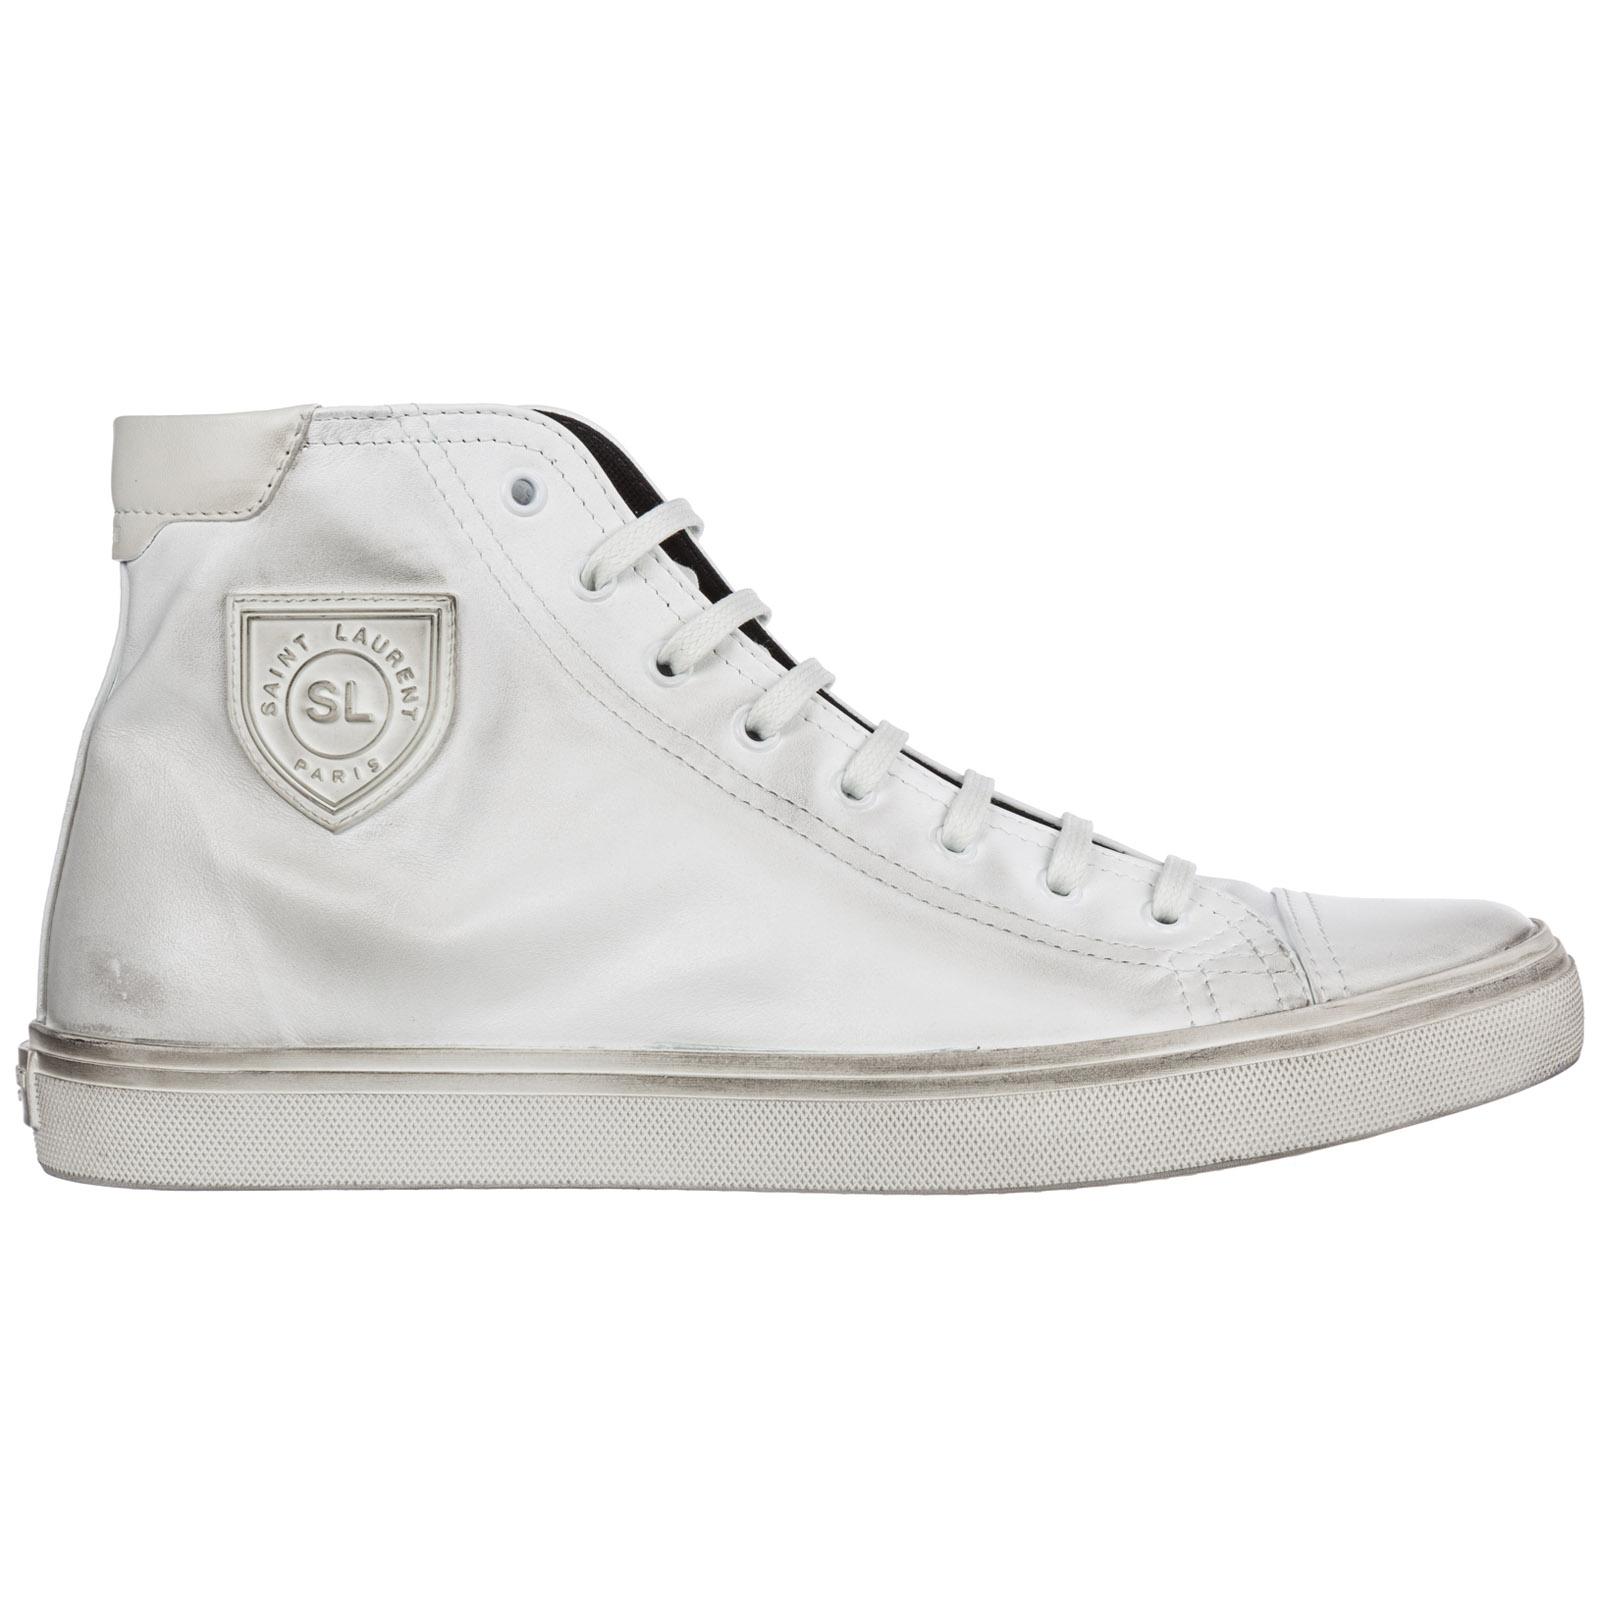 062177fa104 Sneakers Saint Laurent Bedford 5138310O6109030 blanc optic | FRMODA.com